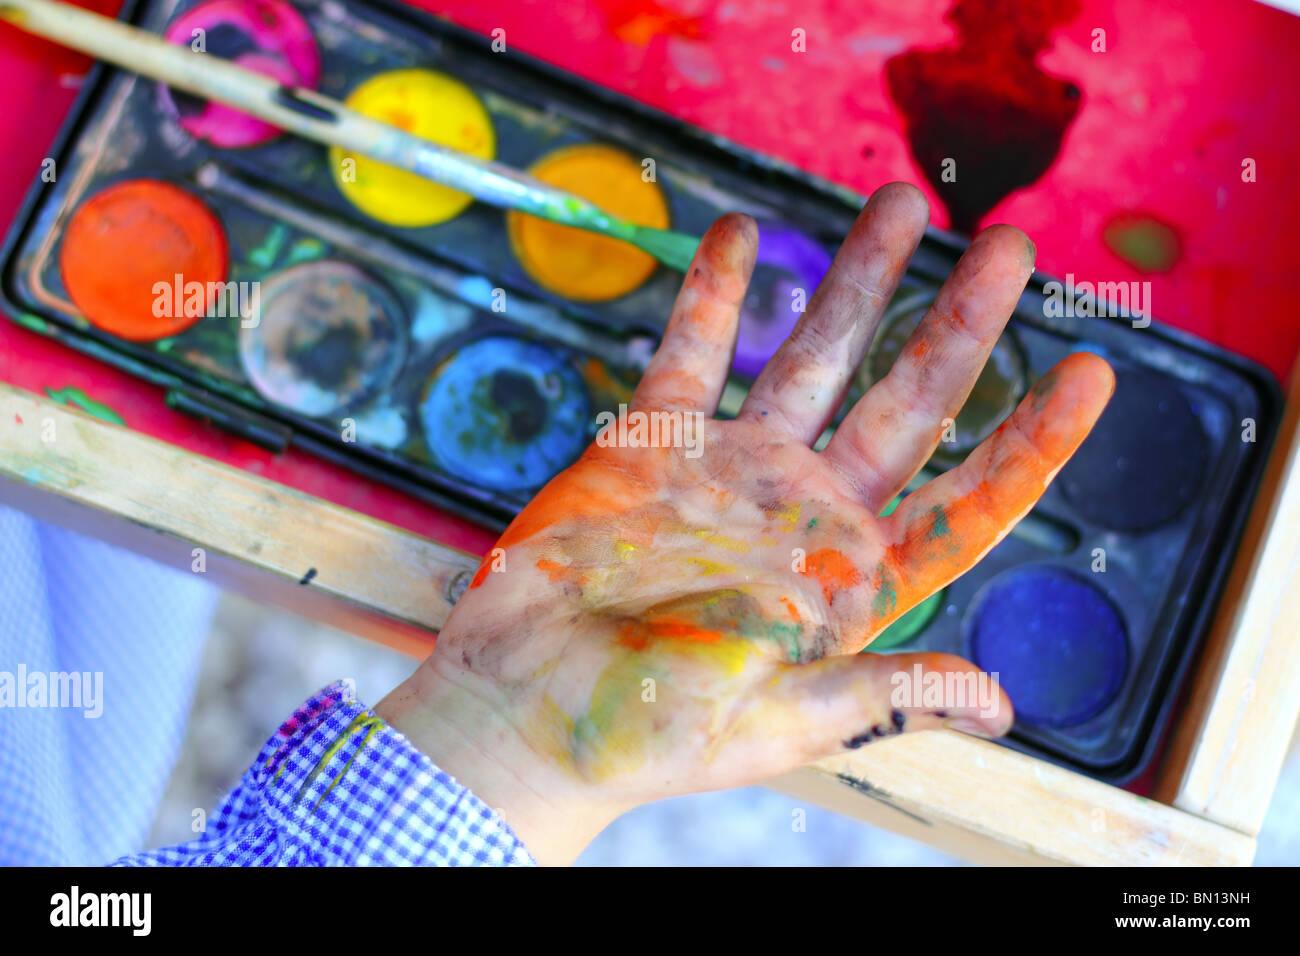 Künstler Kinder Malen Aquarell Pinsel Selbst Schmutzige Hände